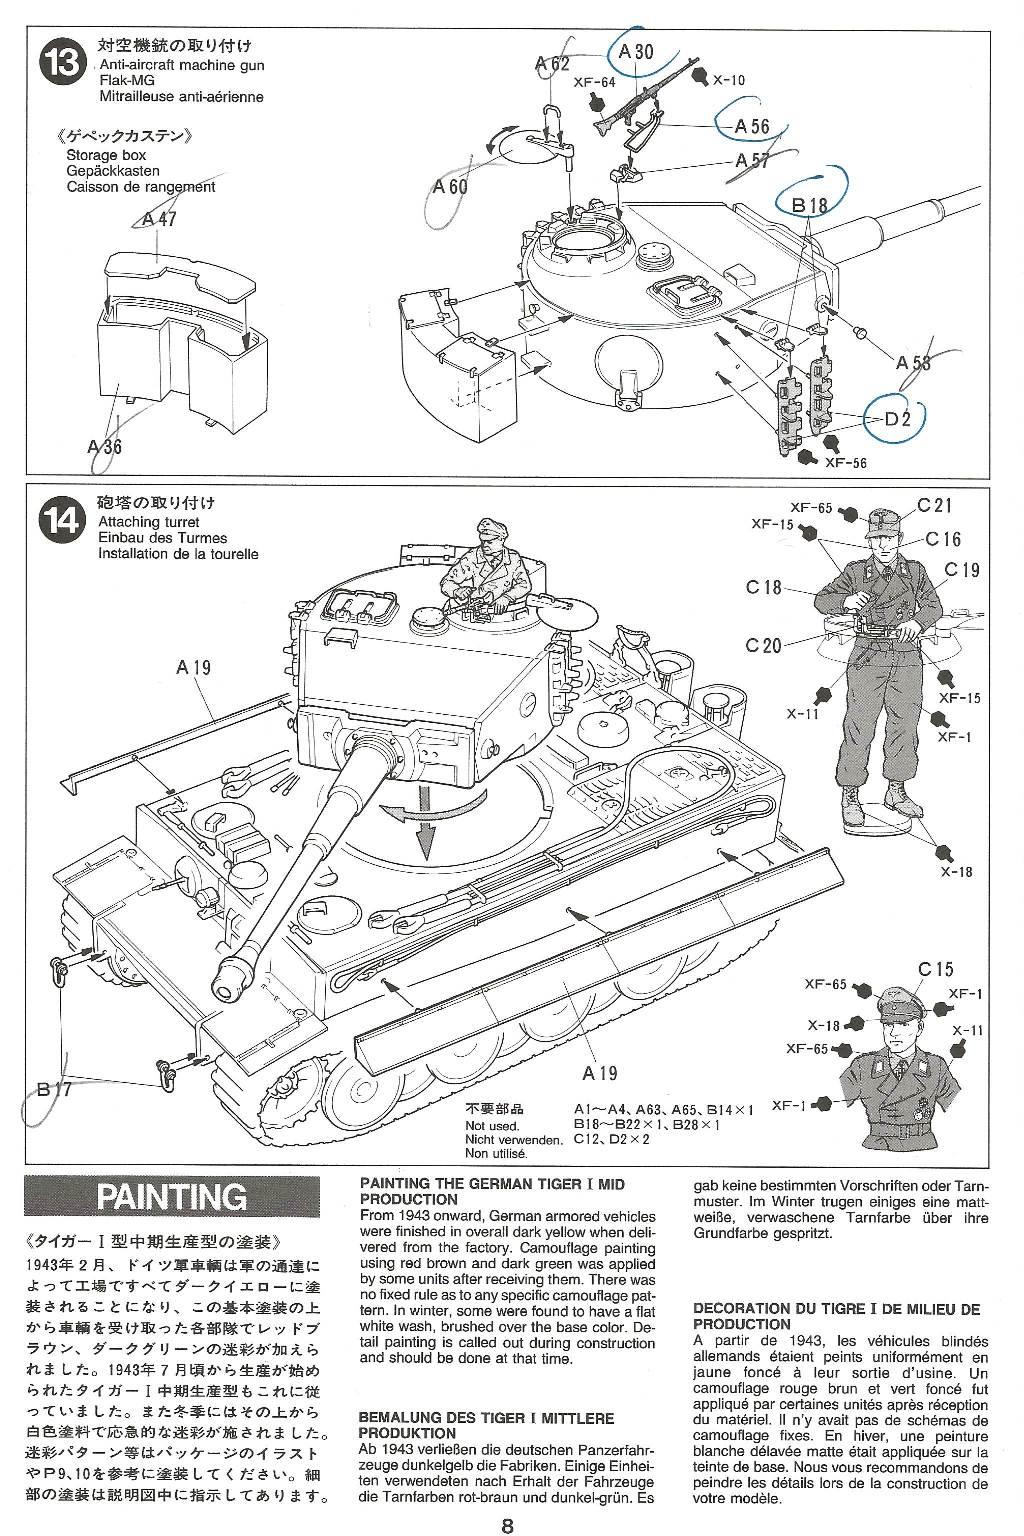 [Tamiya 1/35]  Tiger I mid production réf. 35194 Tigremid-plan-8